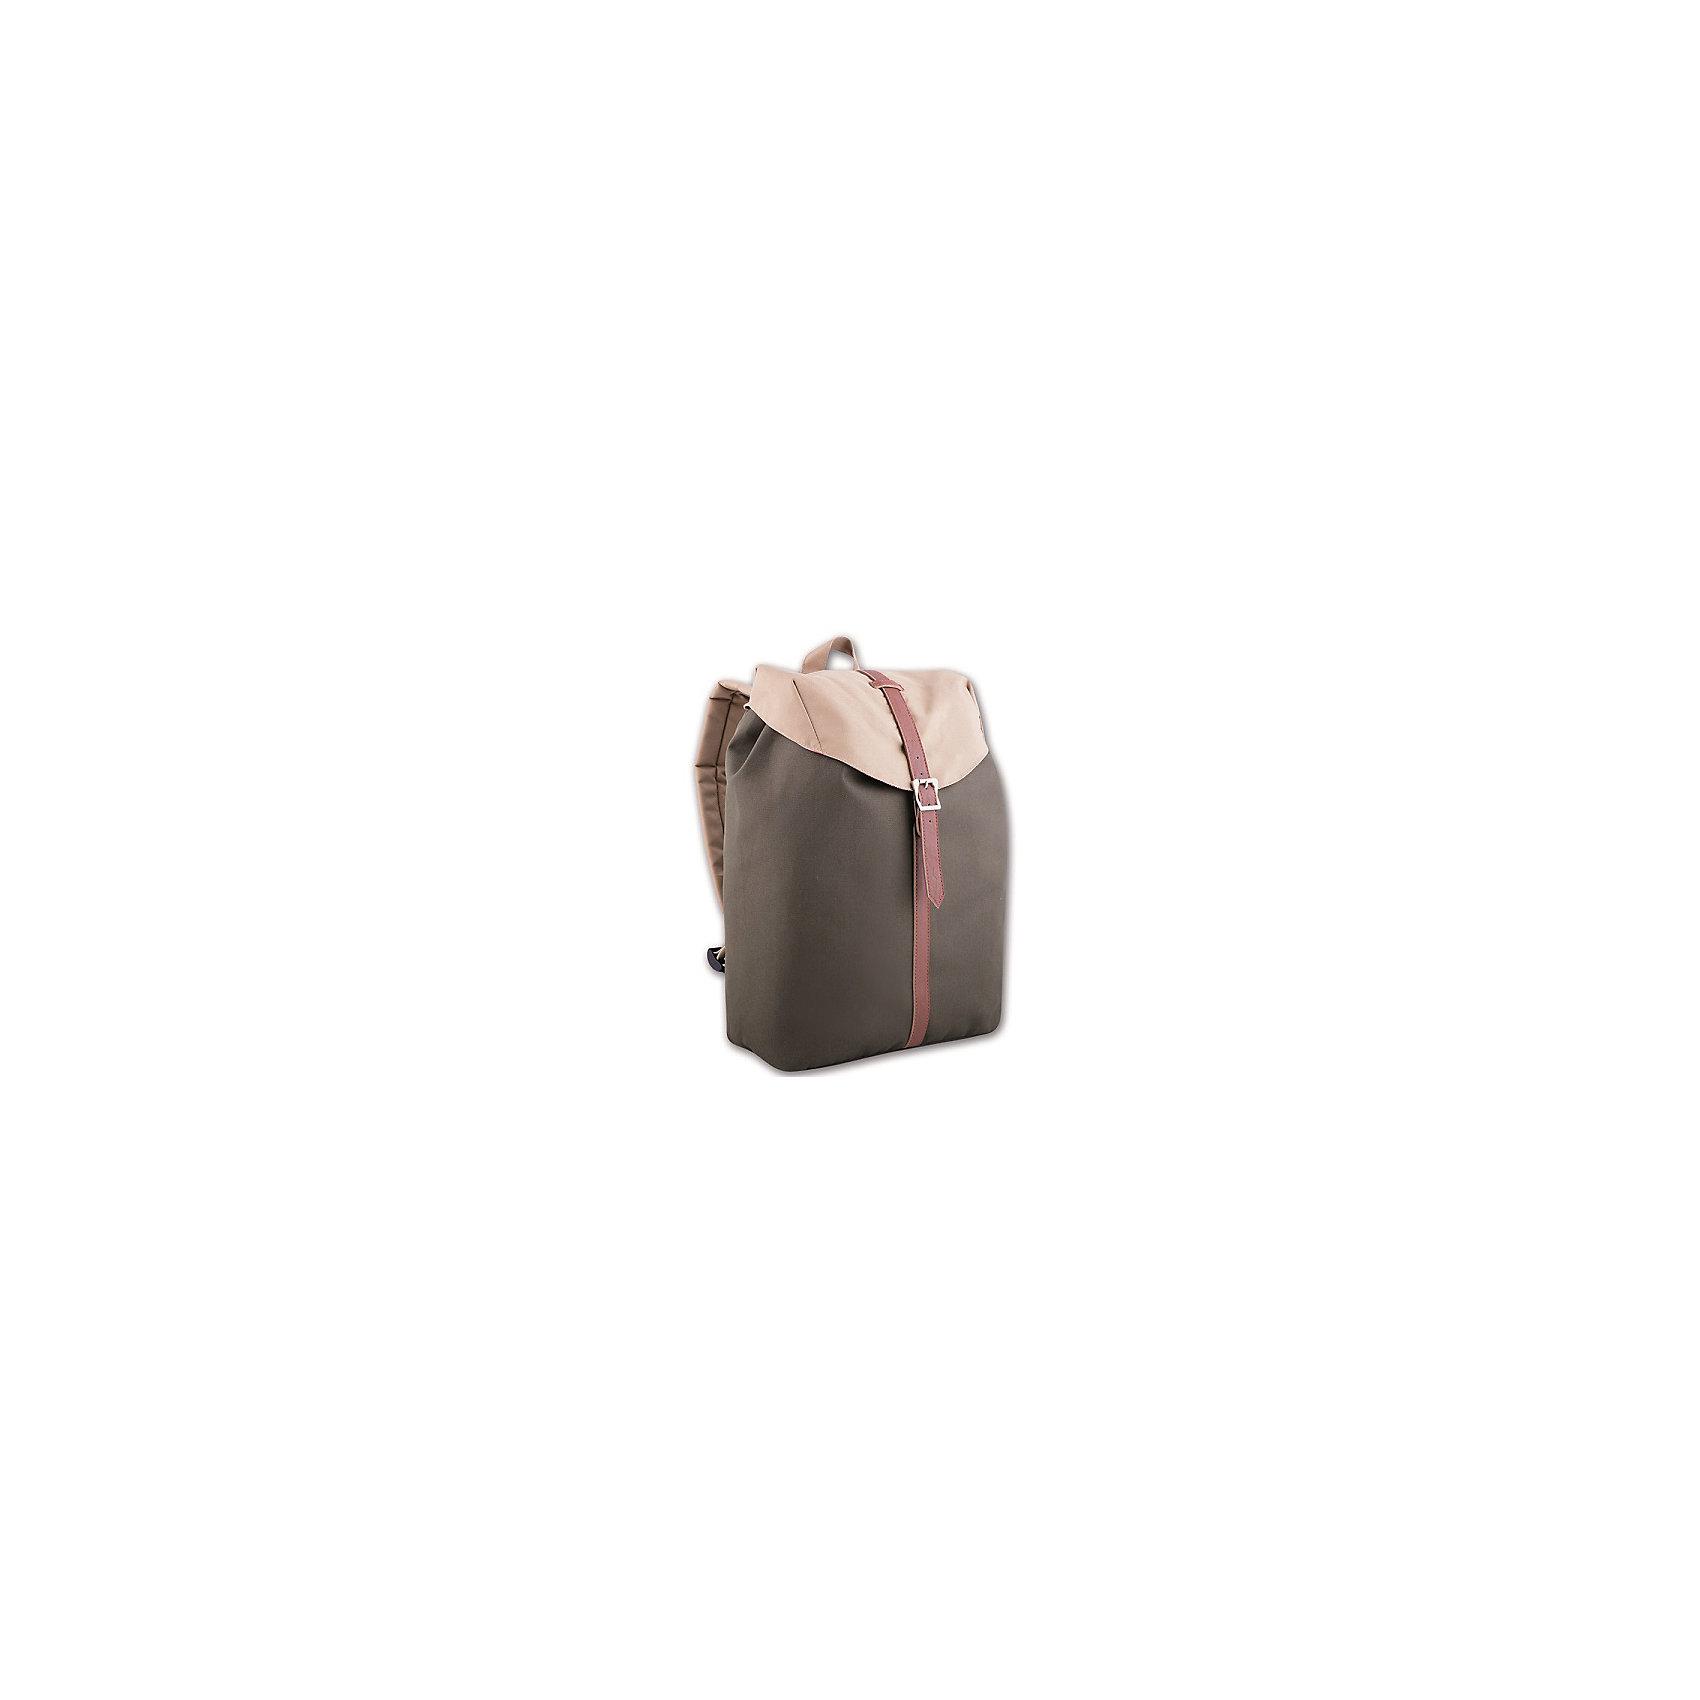 Феникс+ Рюкзак молодежный, серо-бежевый рюкзаки феникс феникс 43654 рюкзак молодежный хаки 29х13х44см